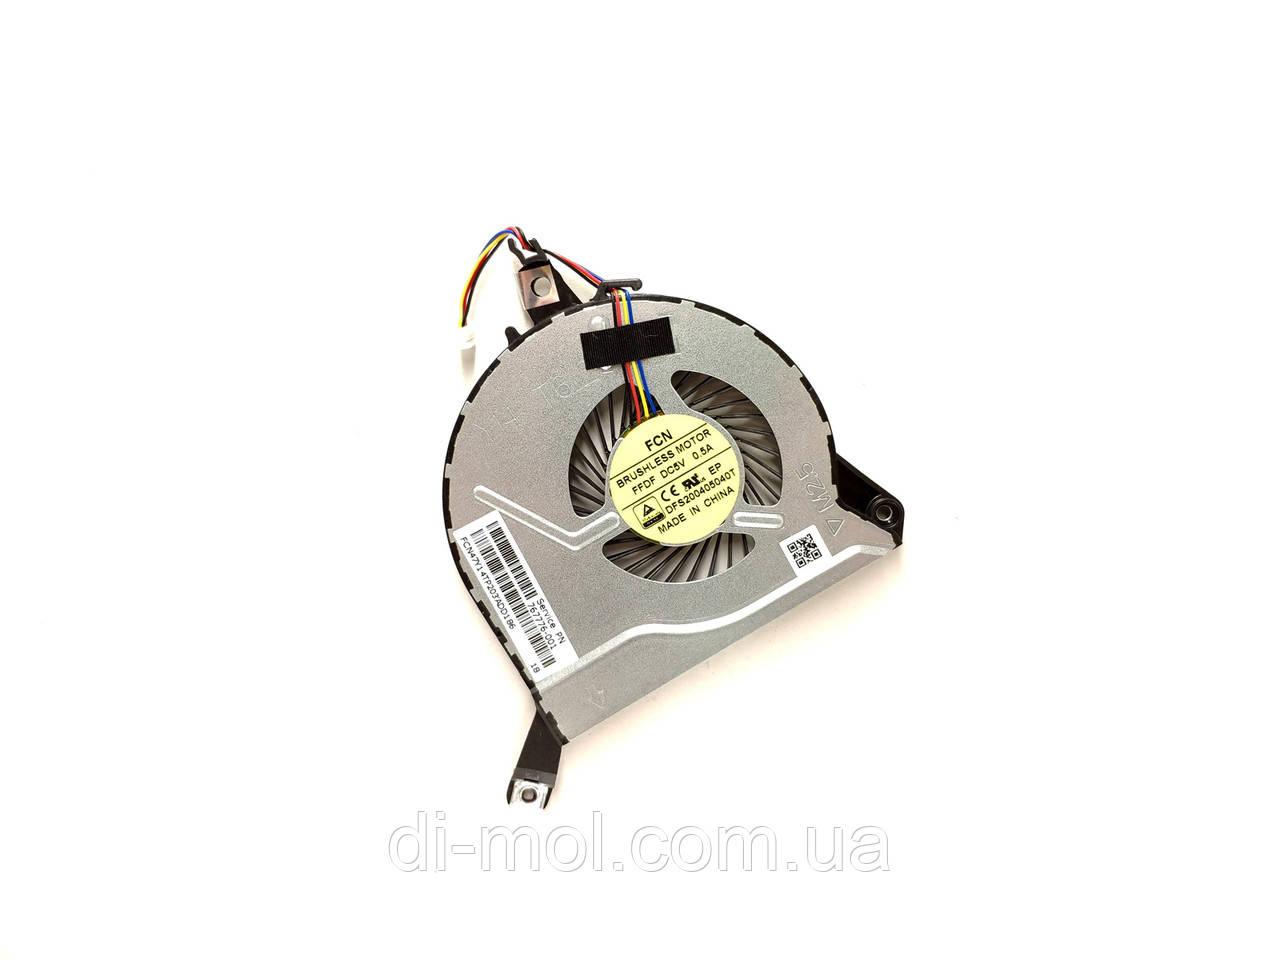 Вентилятор для ноутбука HP Envy 15-K, 15-K000, 15-K100, 15-K200, 14-U, Pavilion 15-P000, 15-P100, 15-P200